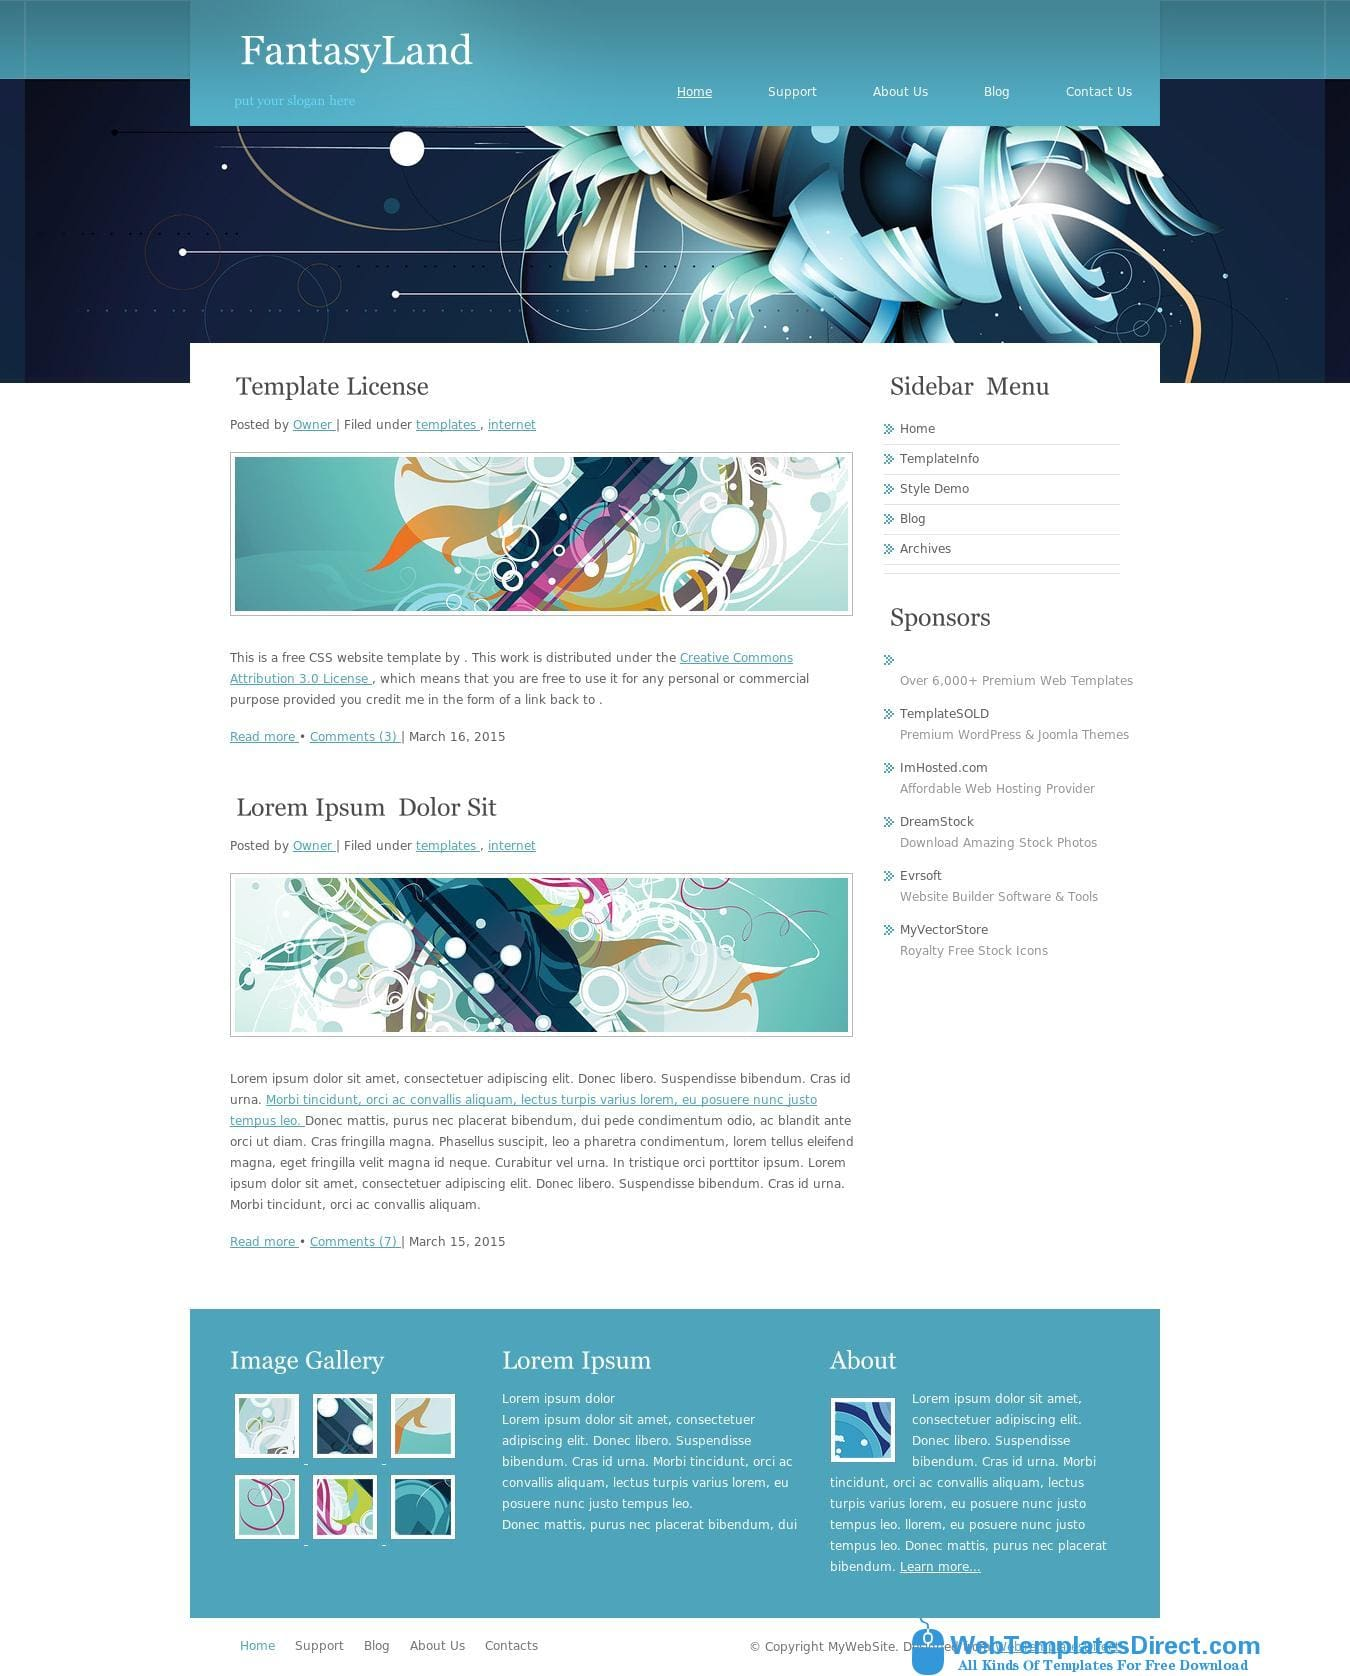 FantasyLand Website Template